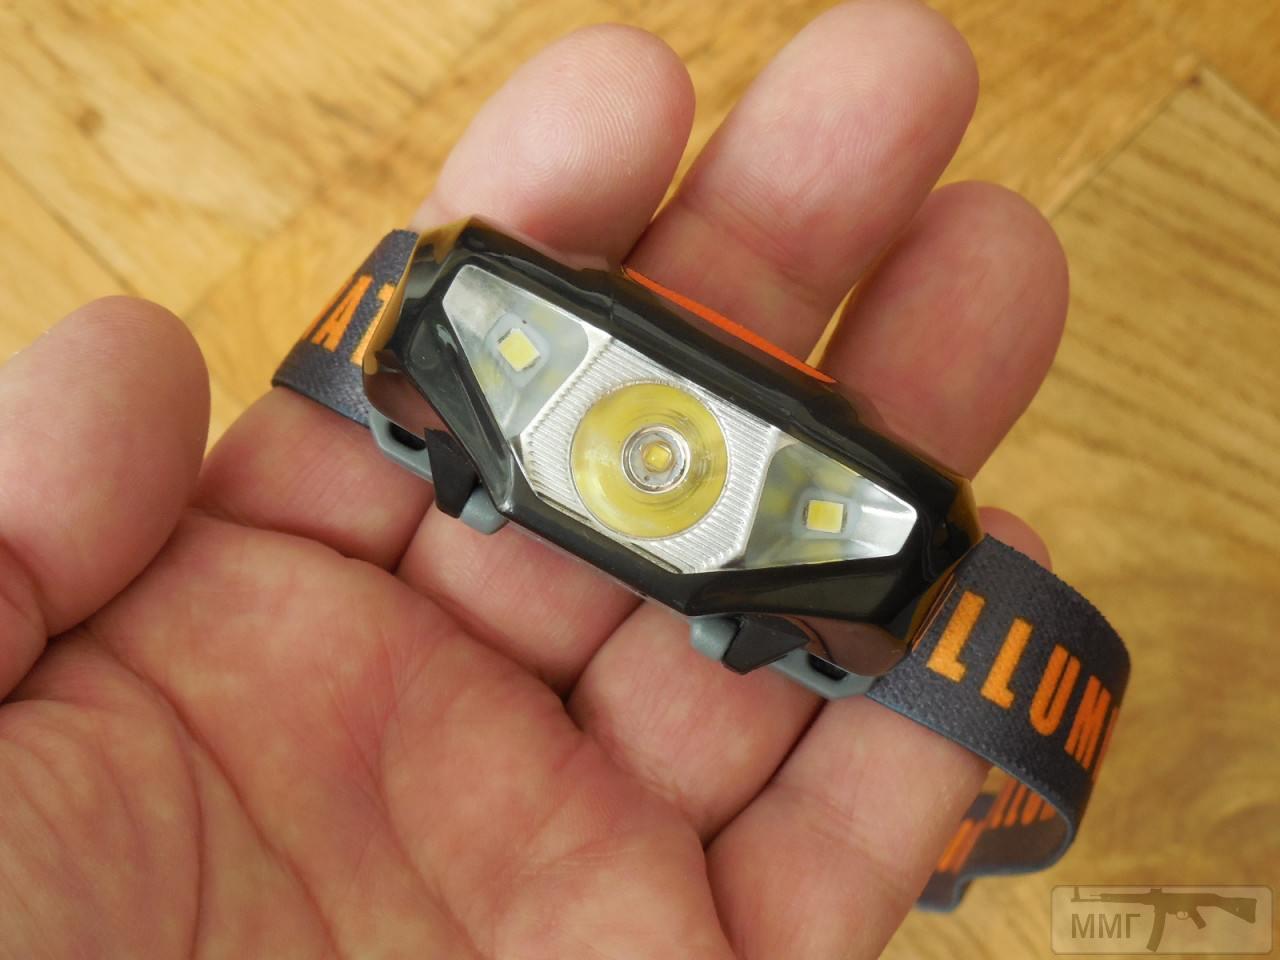 87301 - Налобный фонарь Sunree Ree koпiя на батарейку АА 1,5в. аккум 14500 Li-on